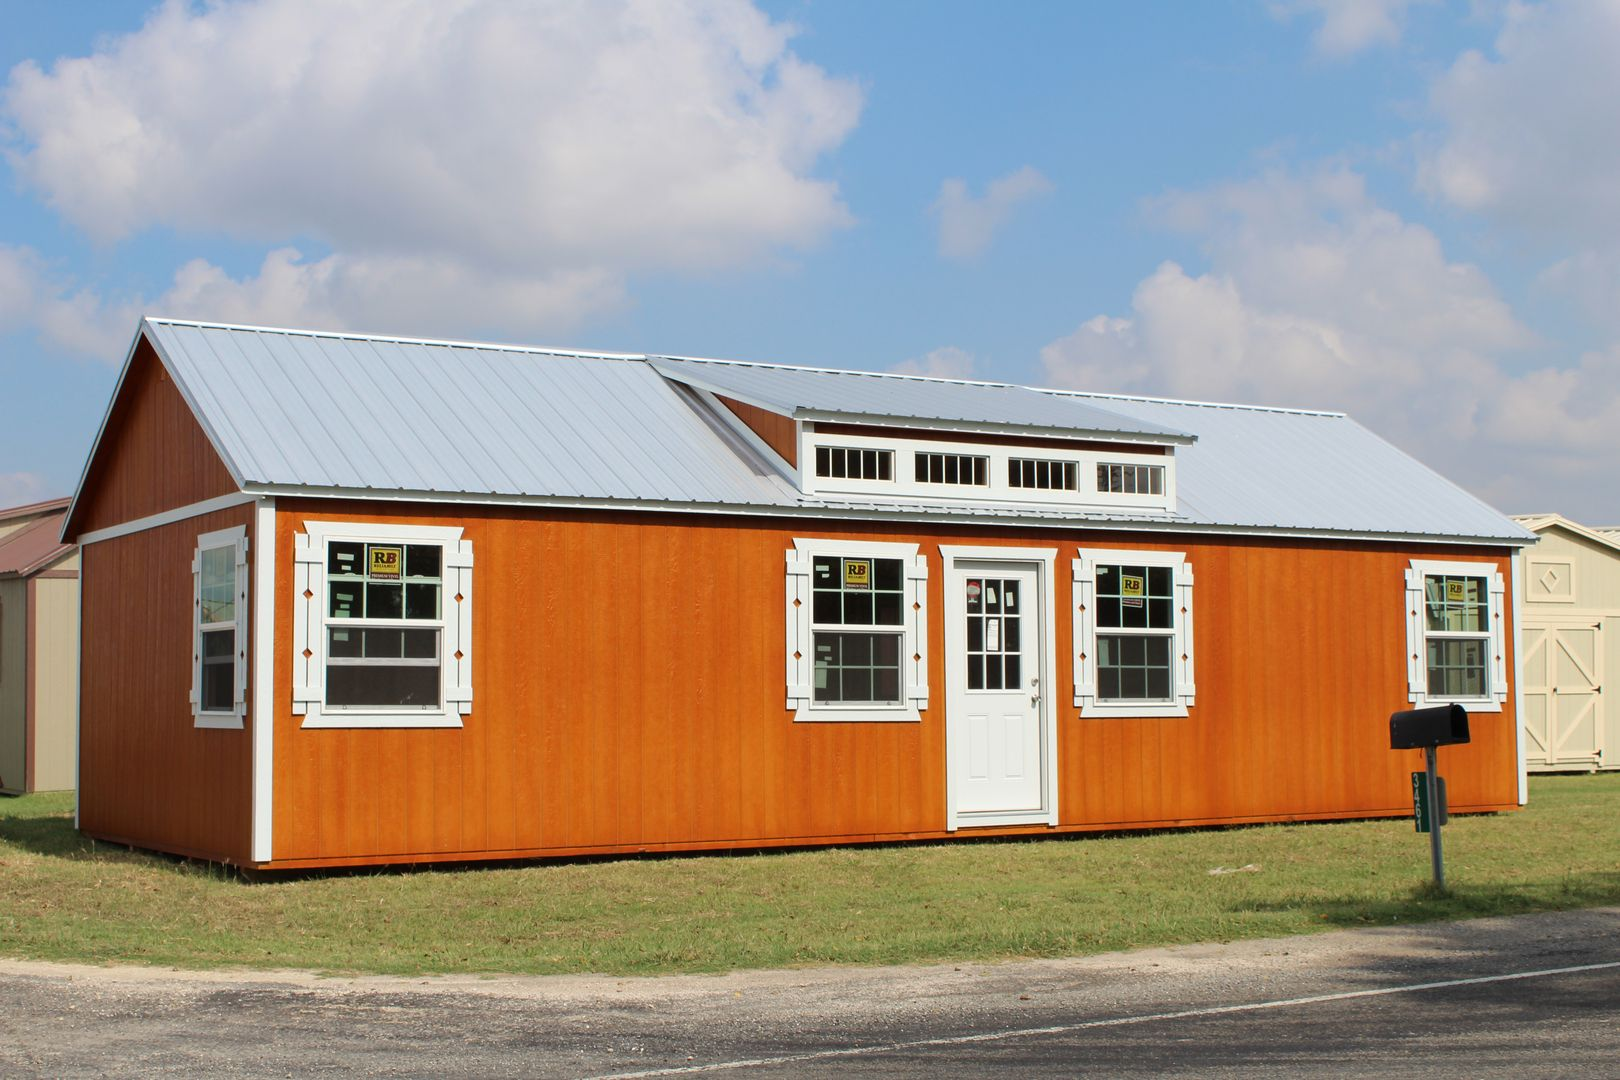 Backyard Portable Buildings Llc | Homideal